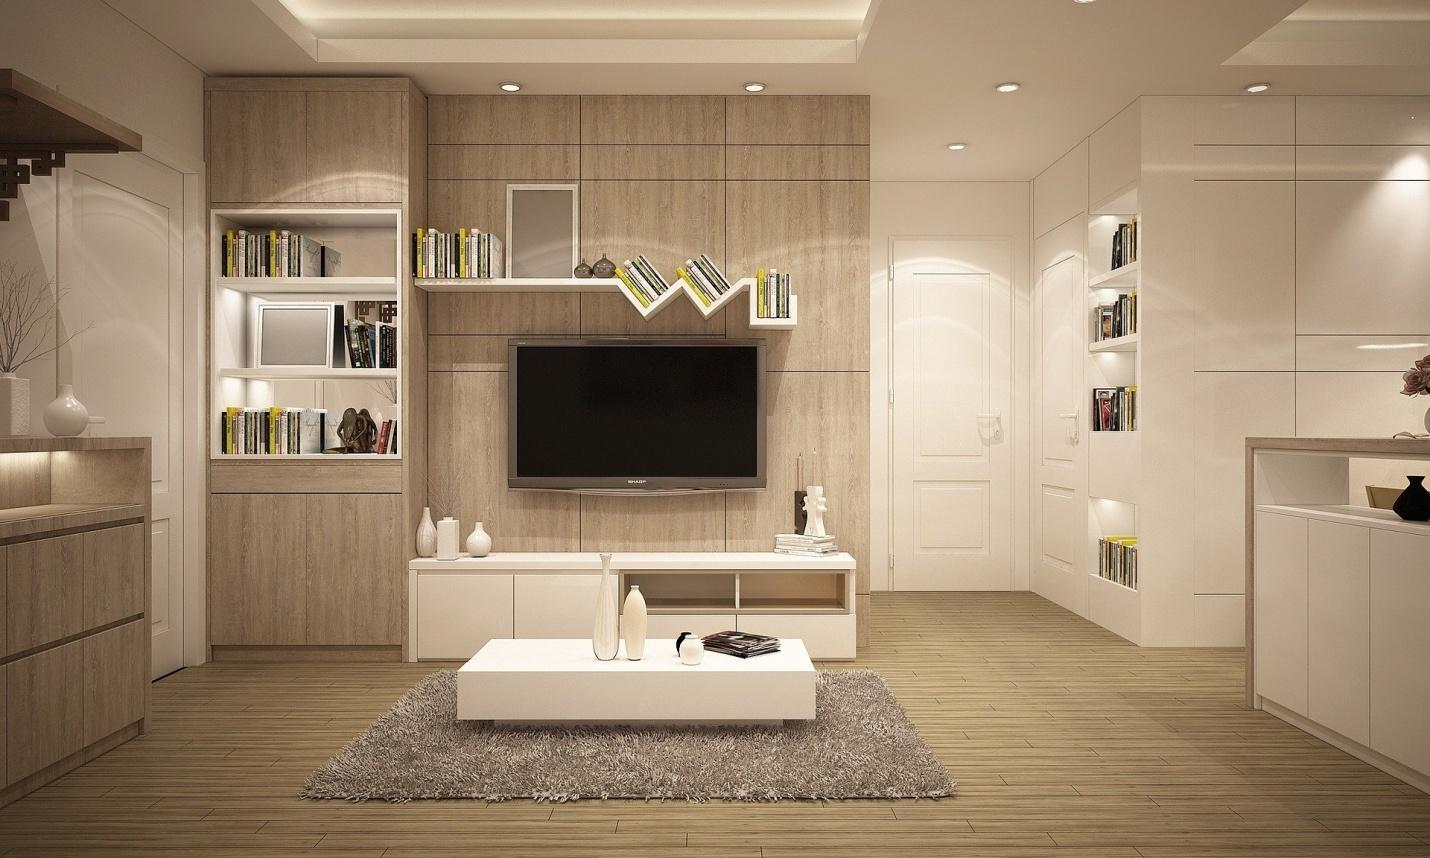 C:\Users\Admin\Downloads\furniture-998265_1920.jpg